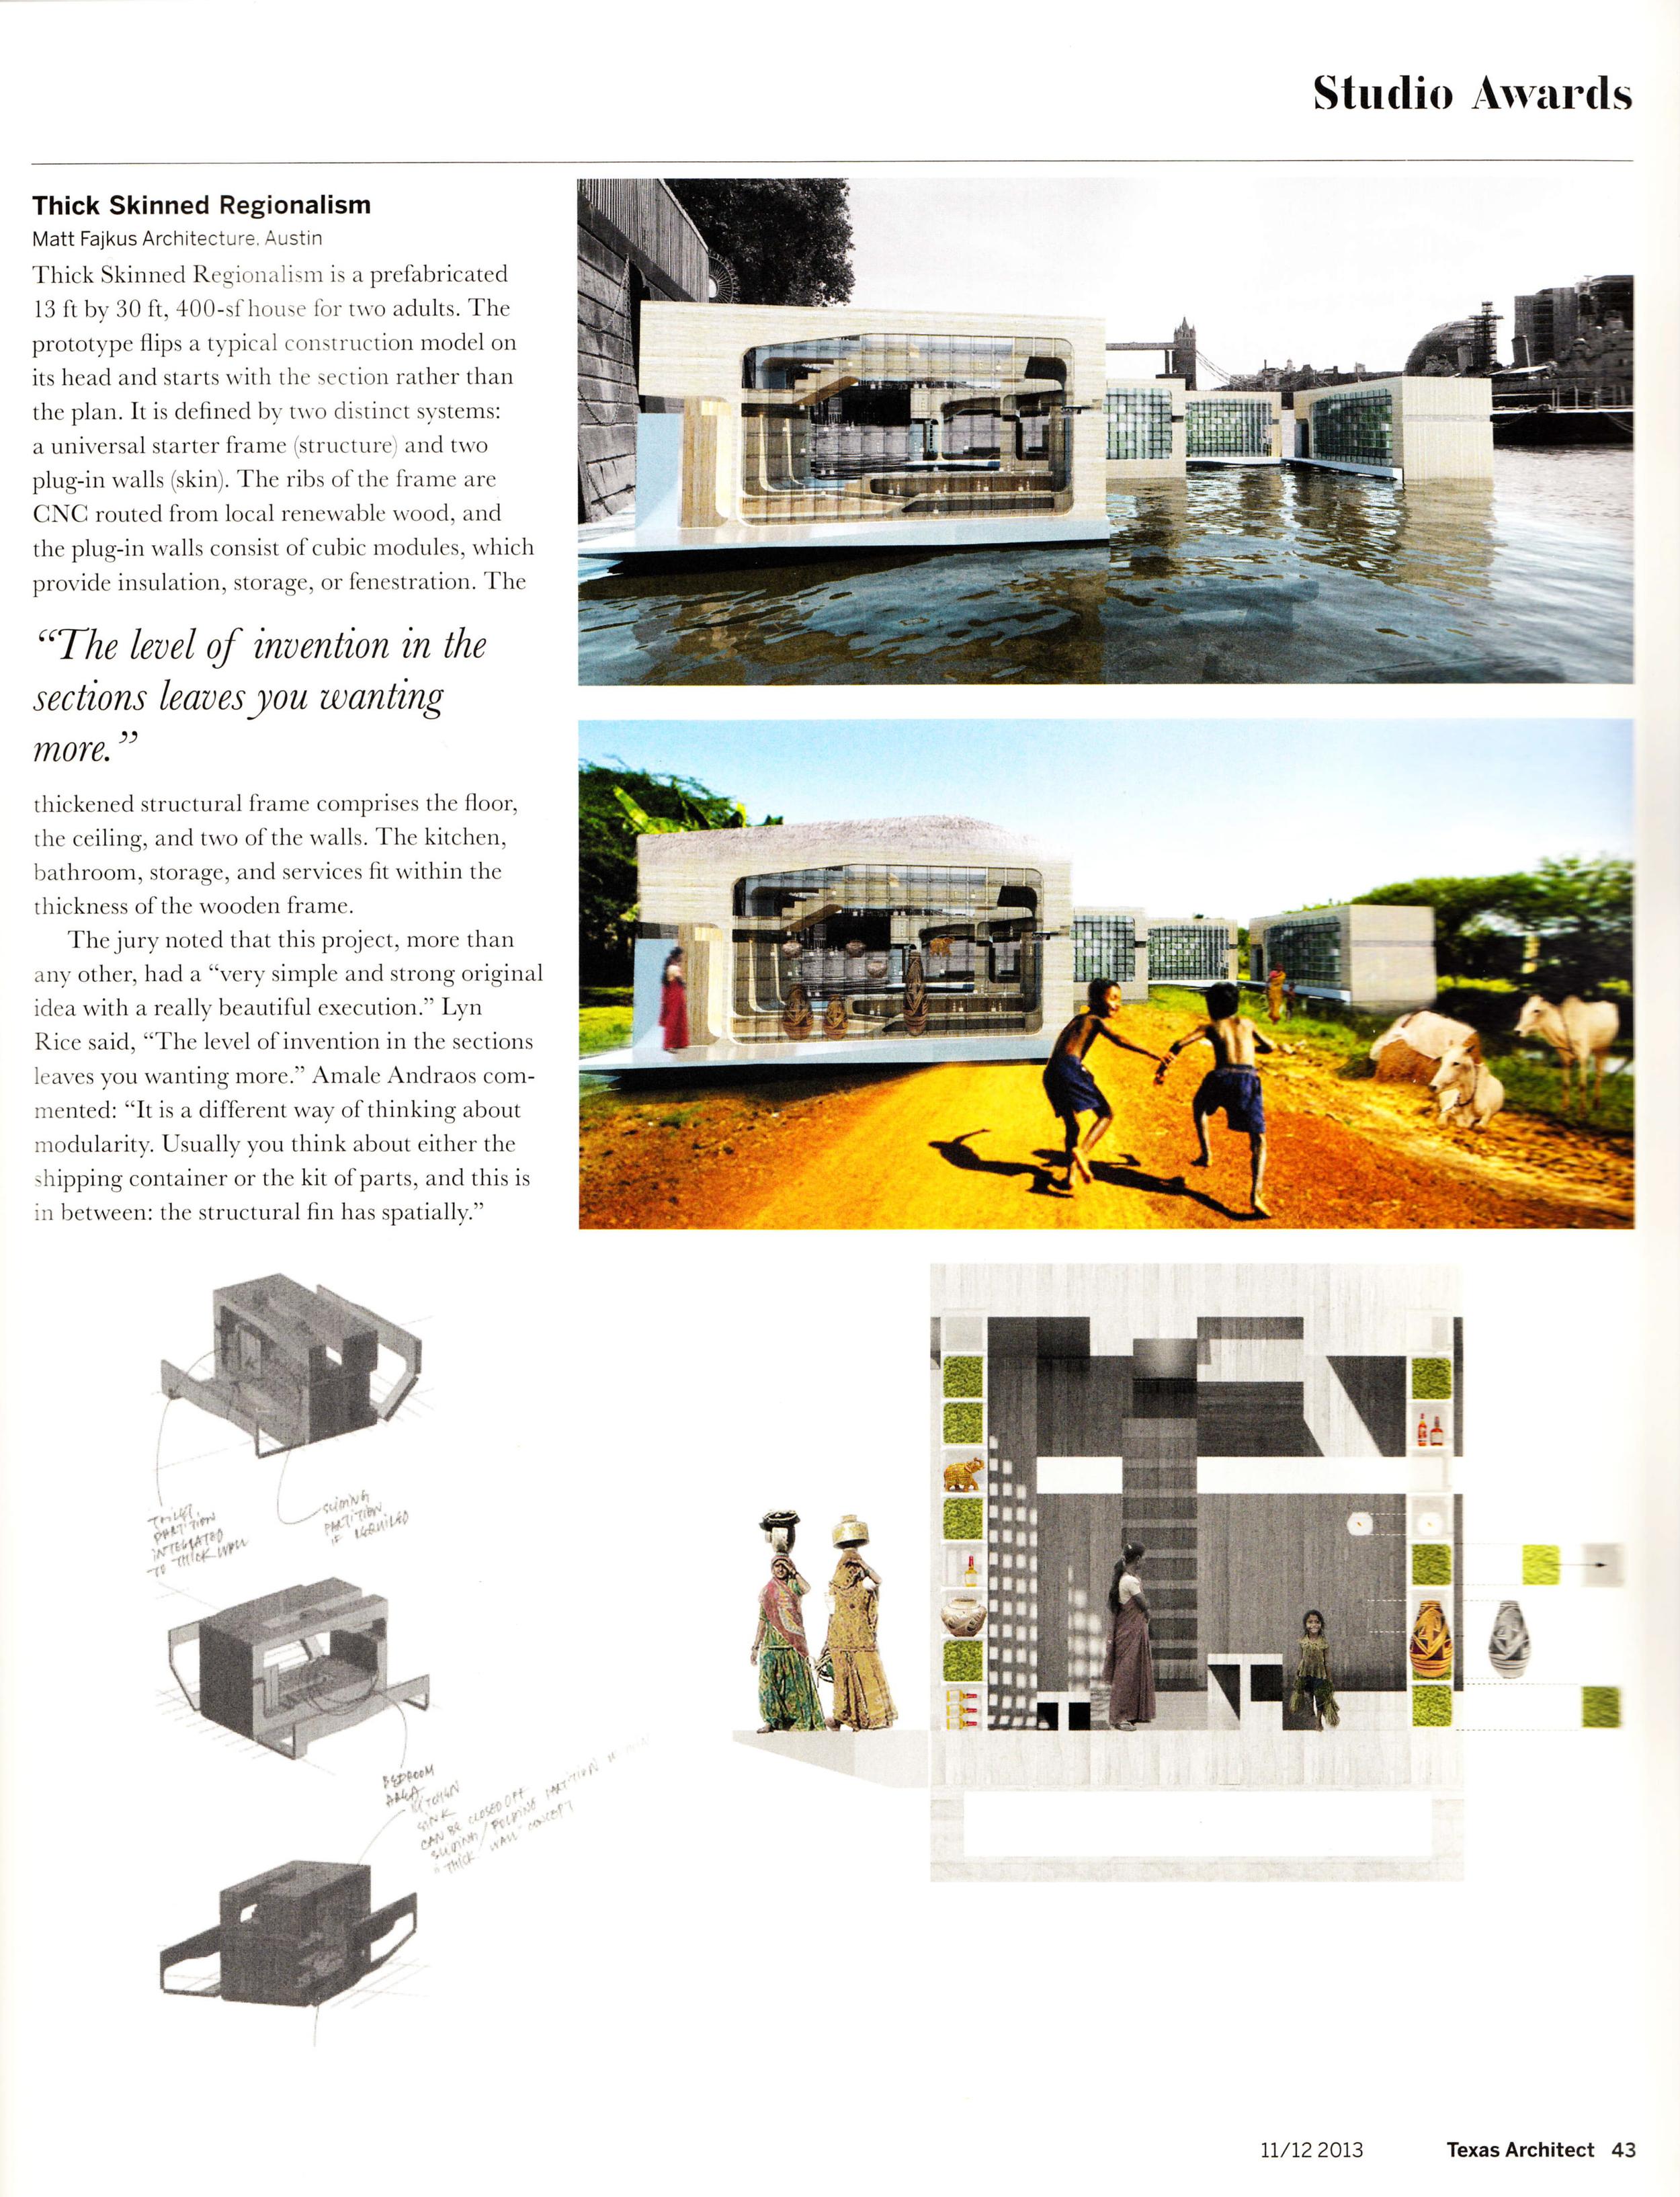 2013_1204_Texas Architect 11122013_Page_7.jpg